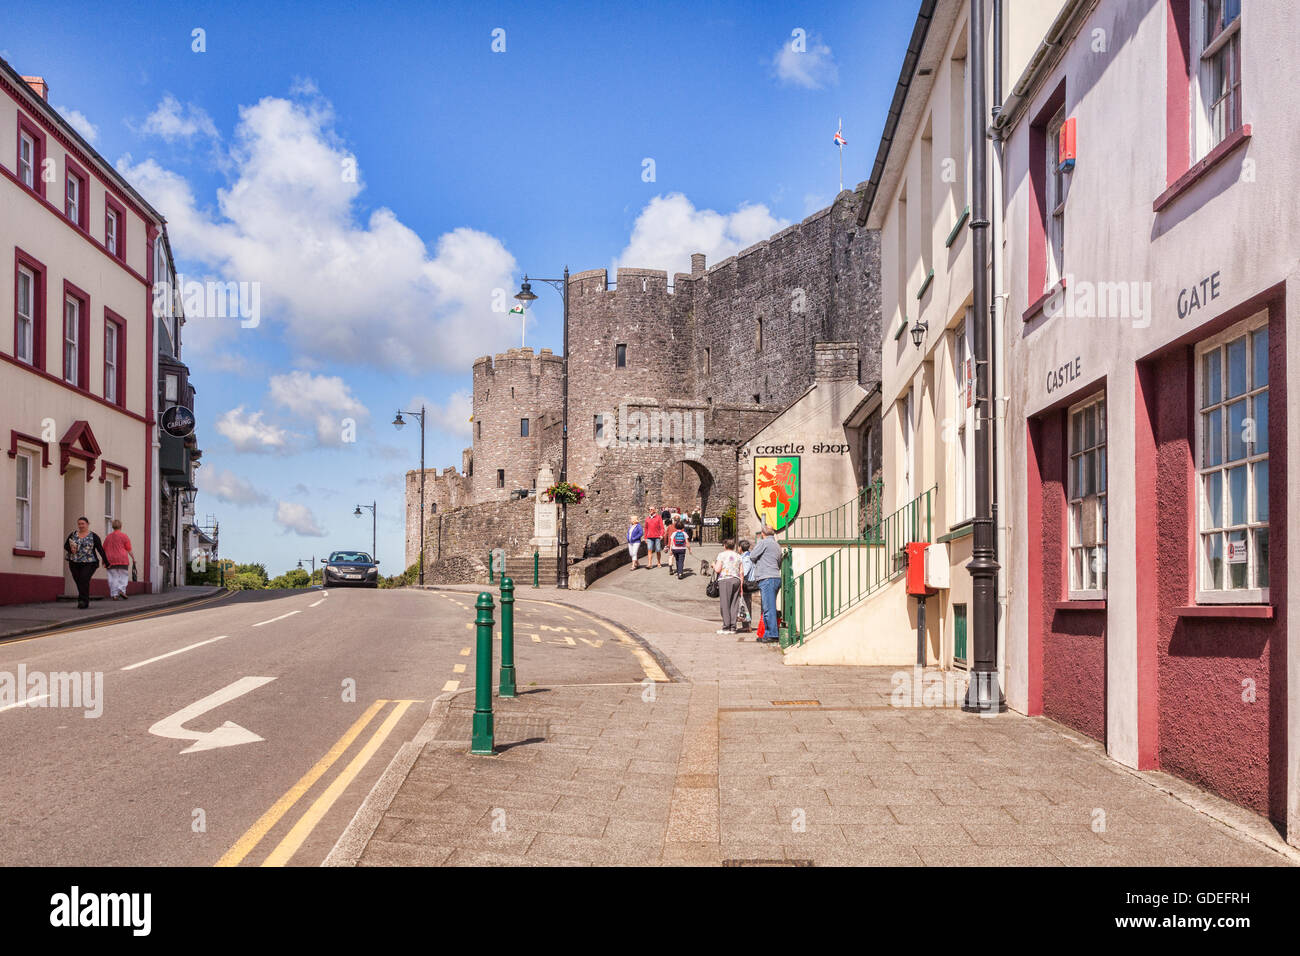 View towards the entrance to Pembroke Castle on Westgate Hill, Pembrokeshire, Wales,UK. - Stock Image